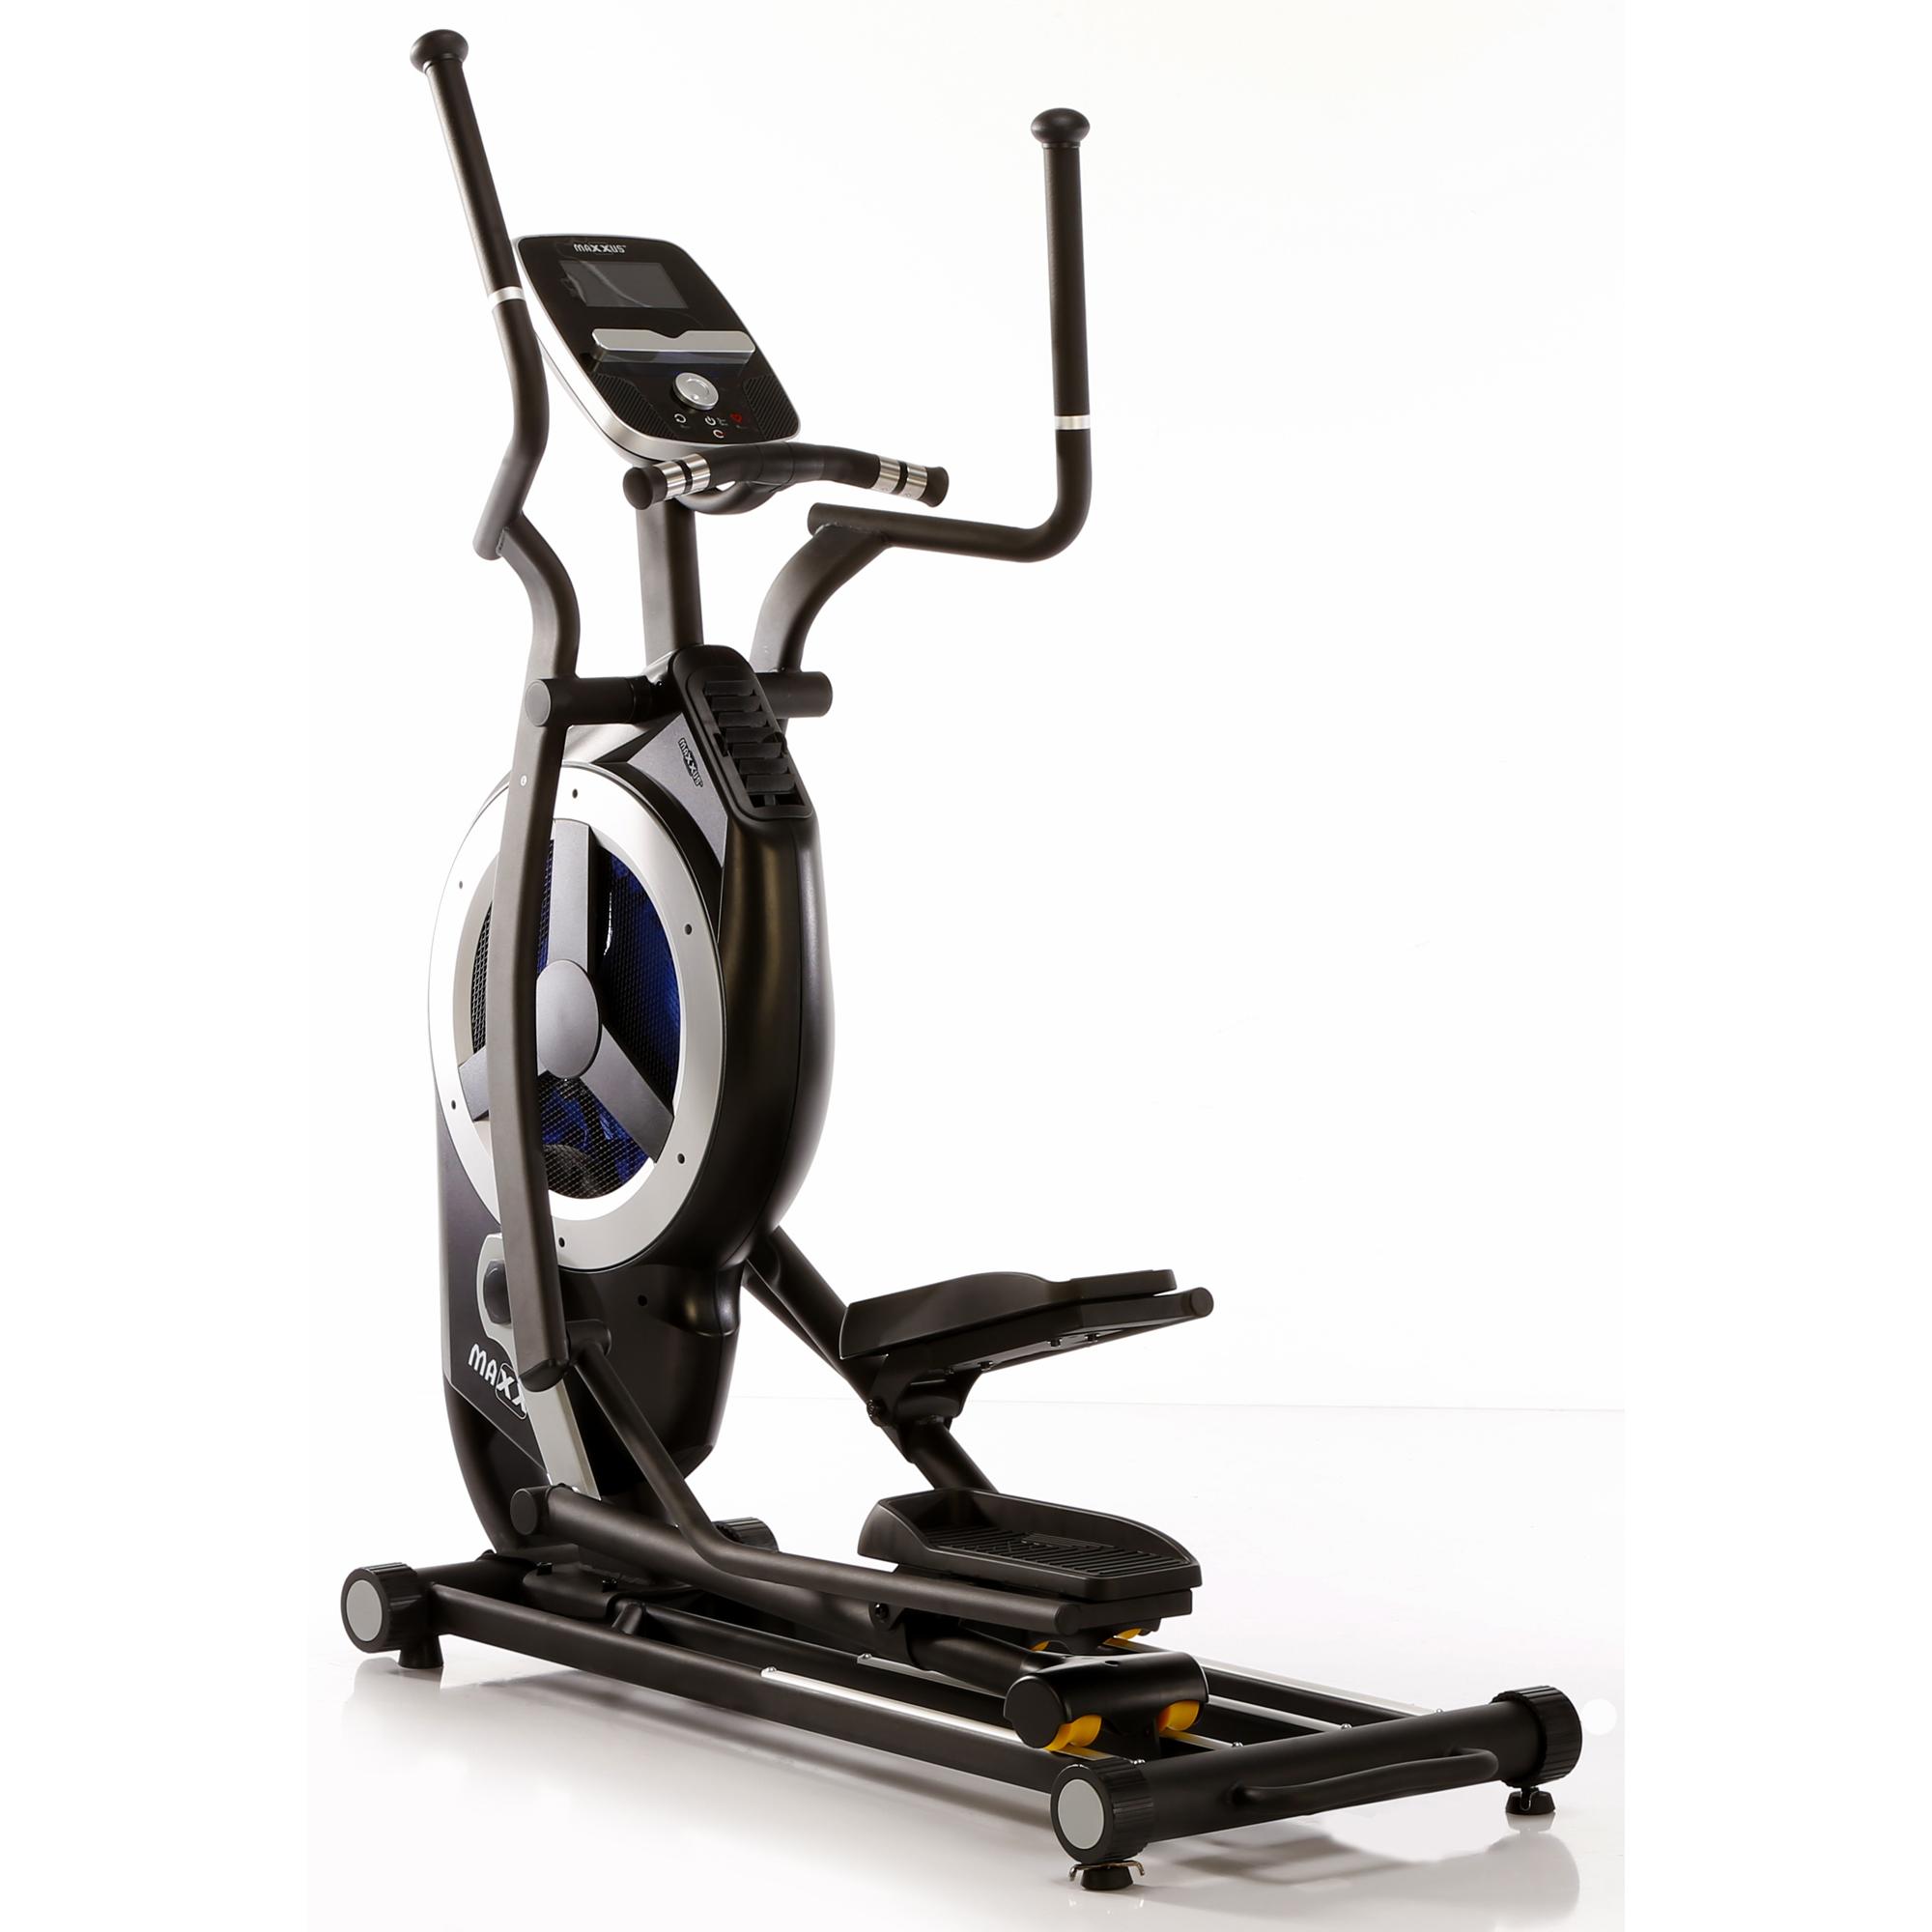 MAXXUS Crosstrainer CX 10.1 Pro